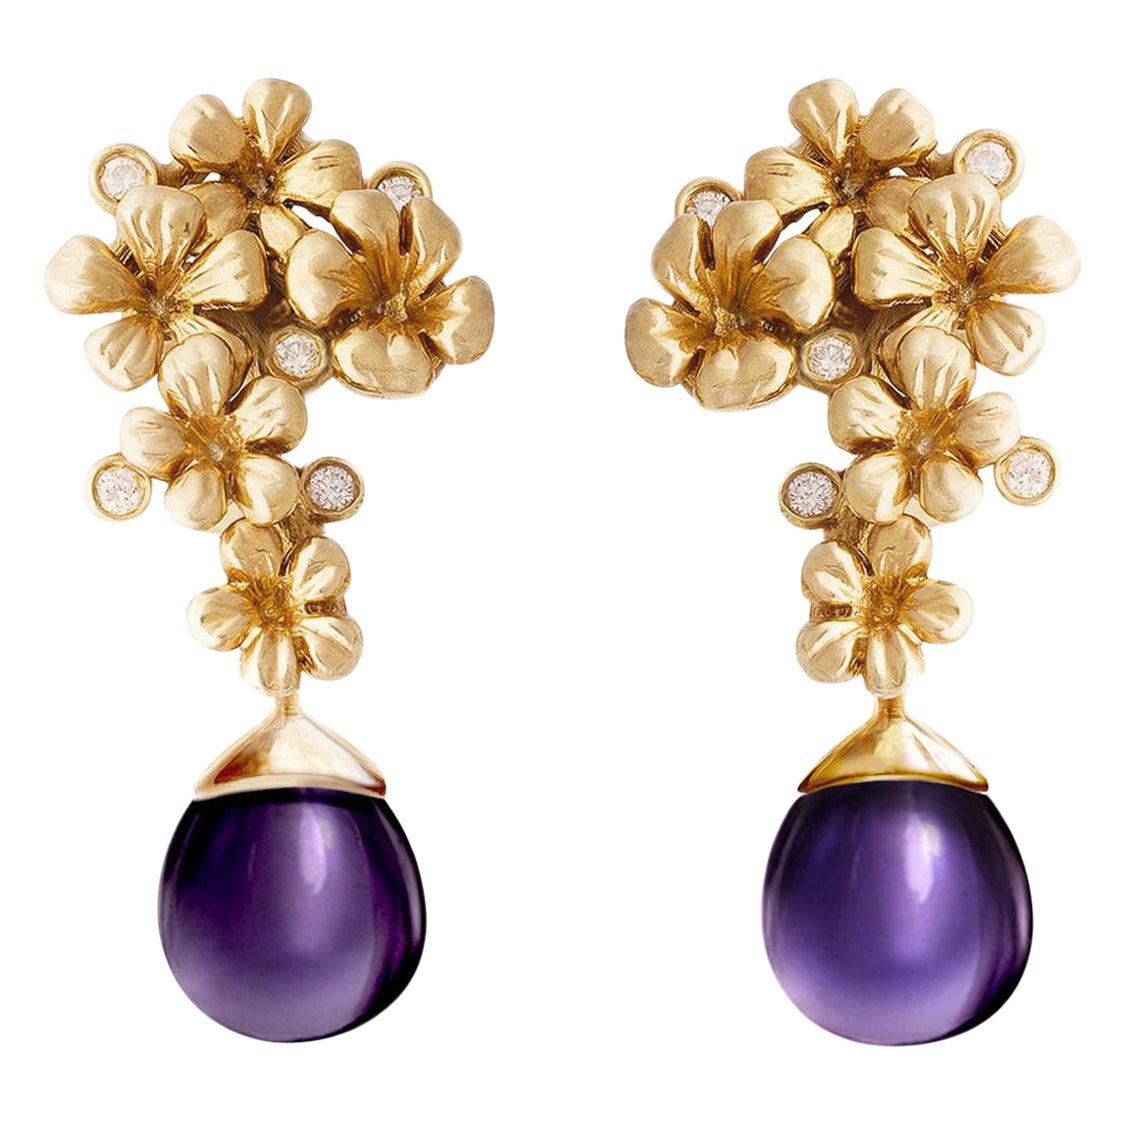 14 Karat Gold Modern Plum Blossom Cocktail Clip-On Earrings with Diamonds